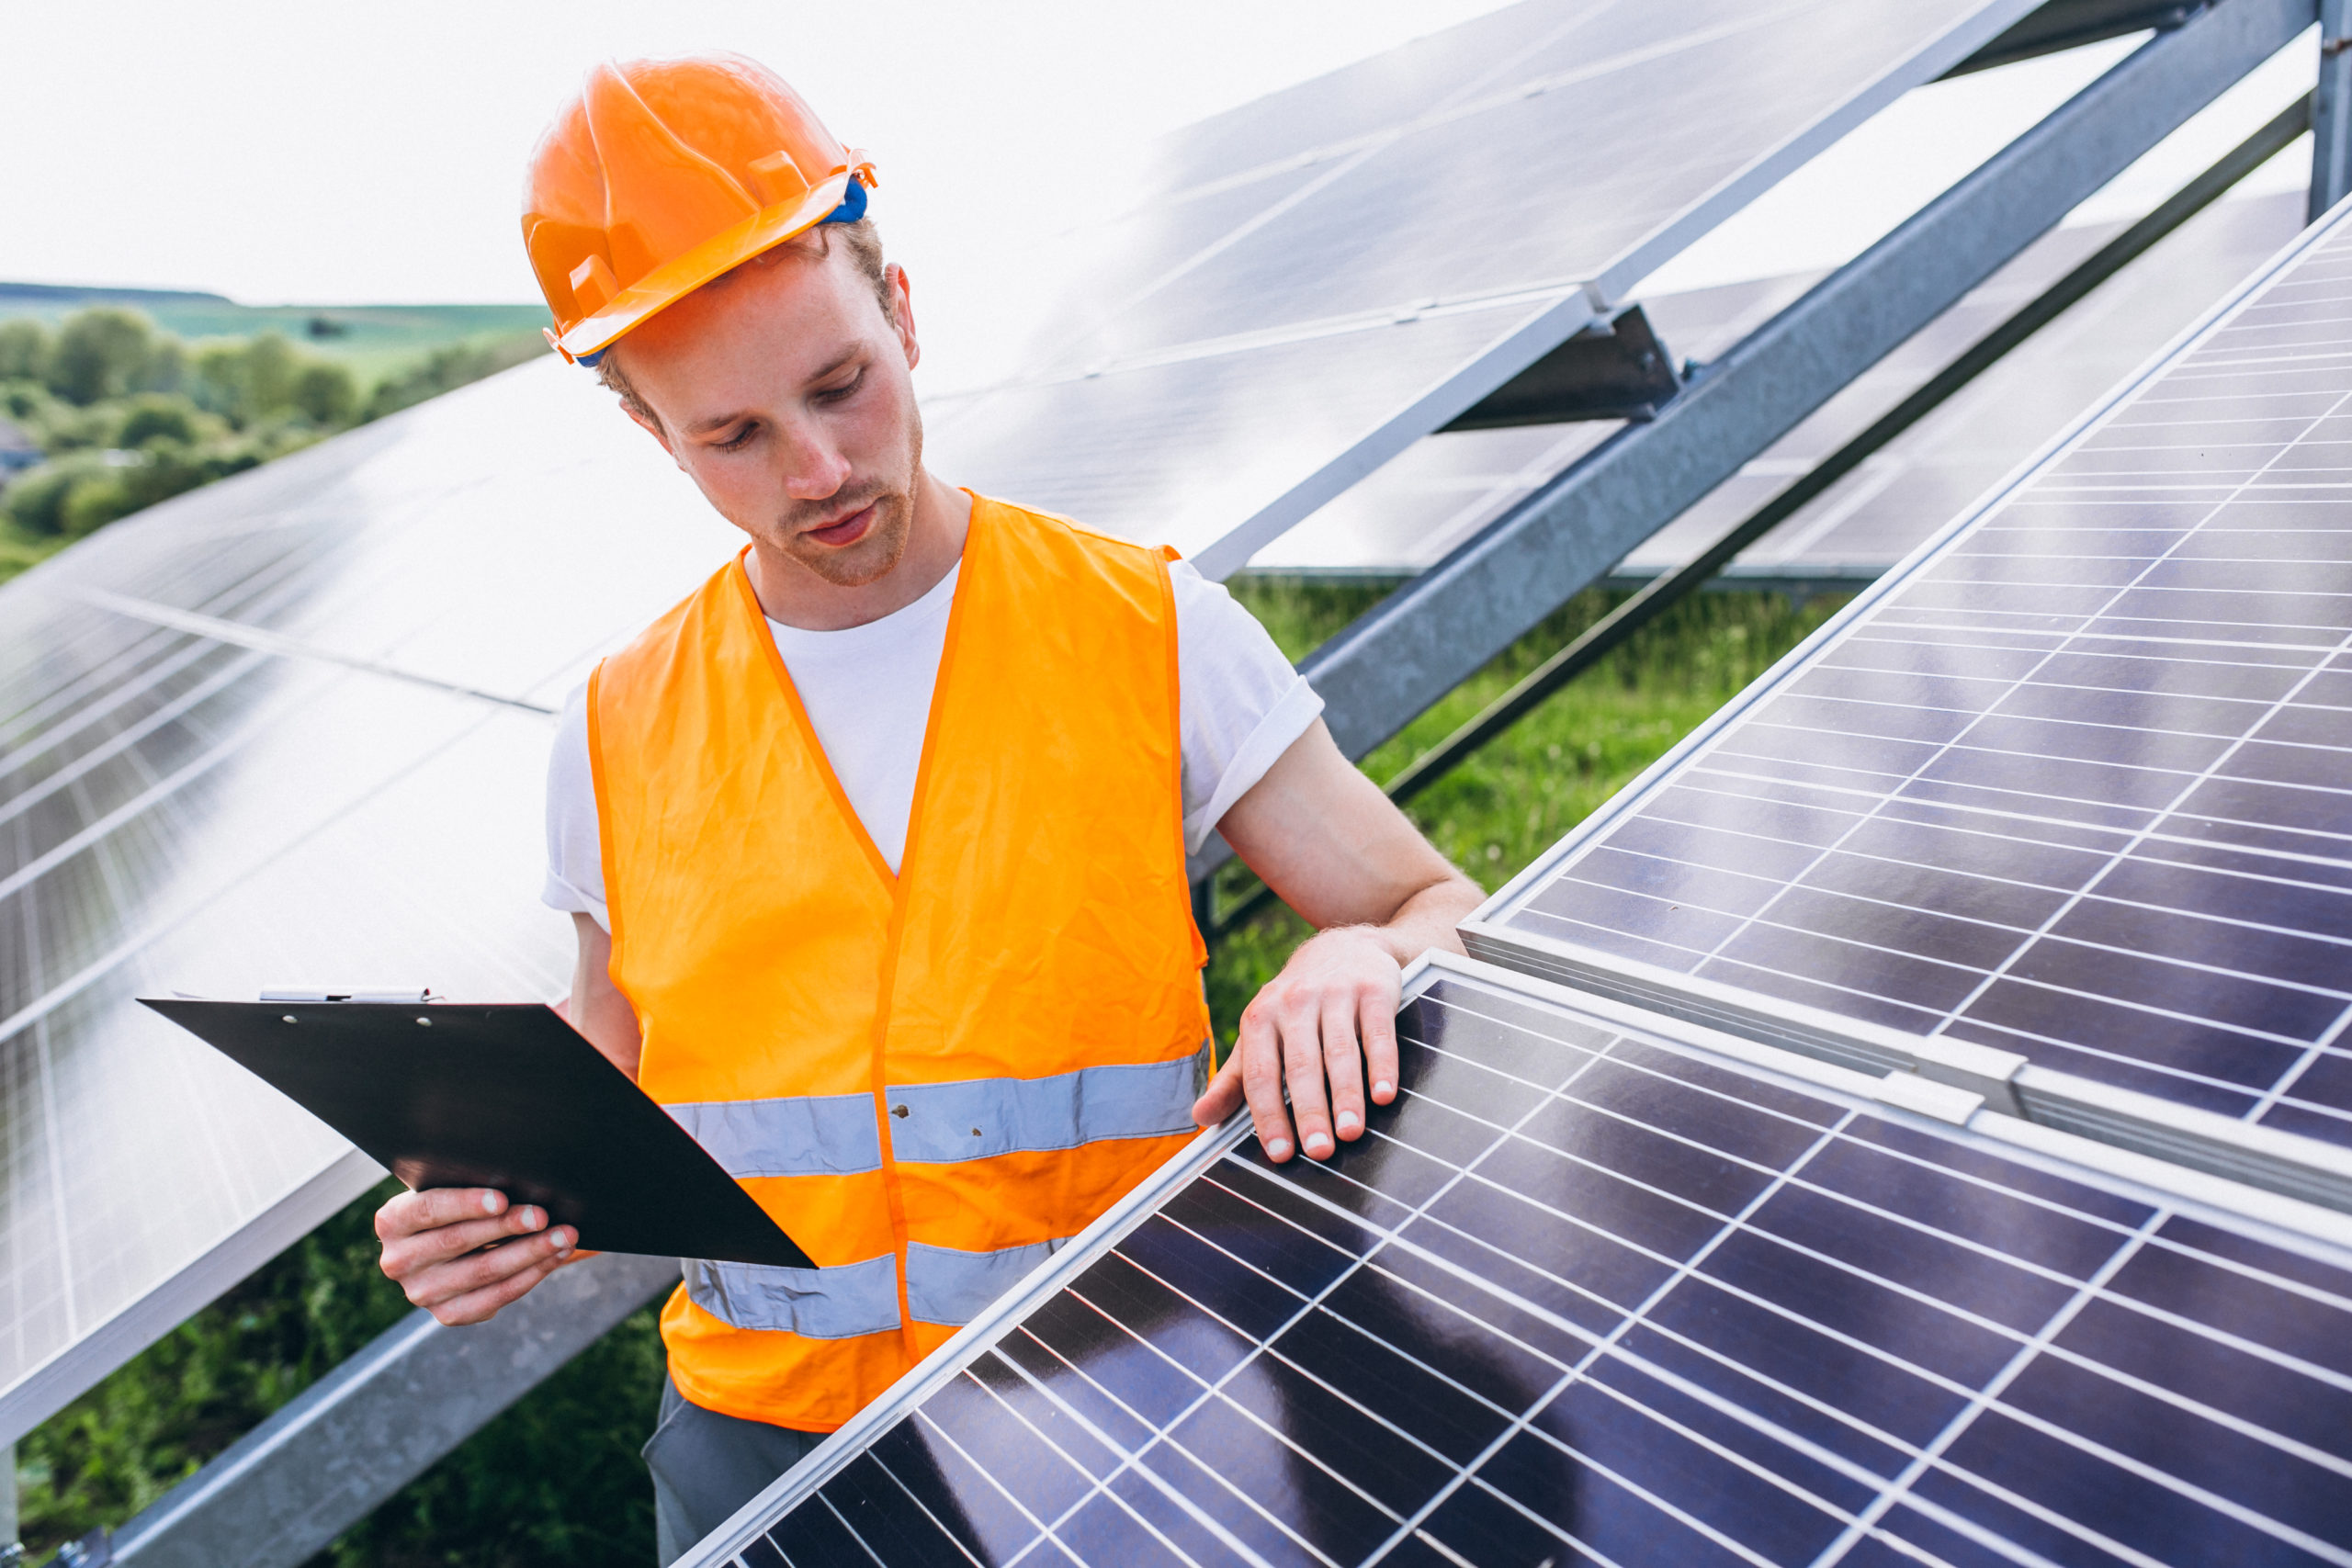 Especialista esclarece 5 principais mitos sobre energia solar